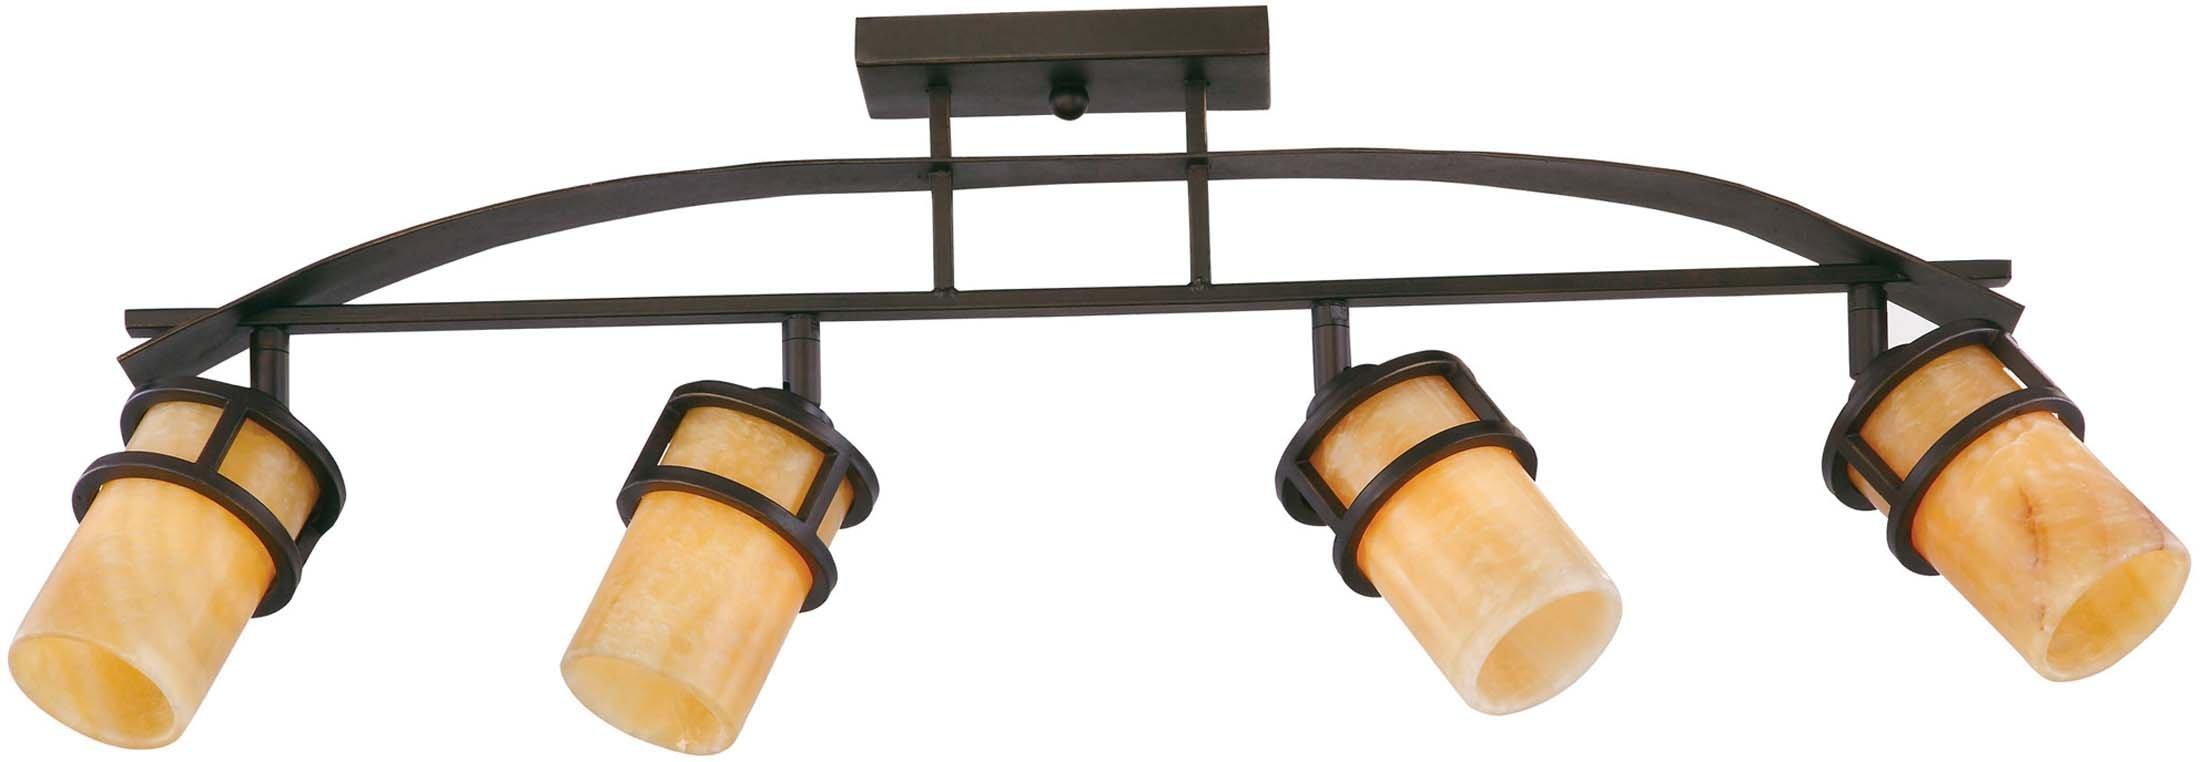 Quoizel KY1404IB Kyle Rustic Track Light Kit, 4-Light, 400 Watts, Imperial Bronze (15'' H x 36'' W)